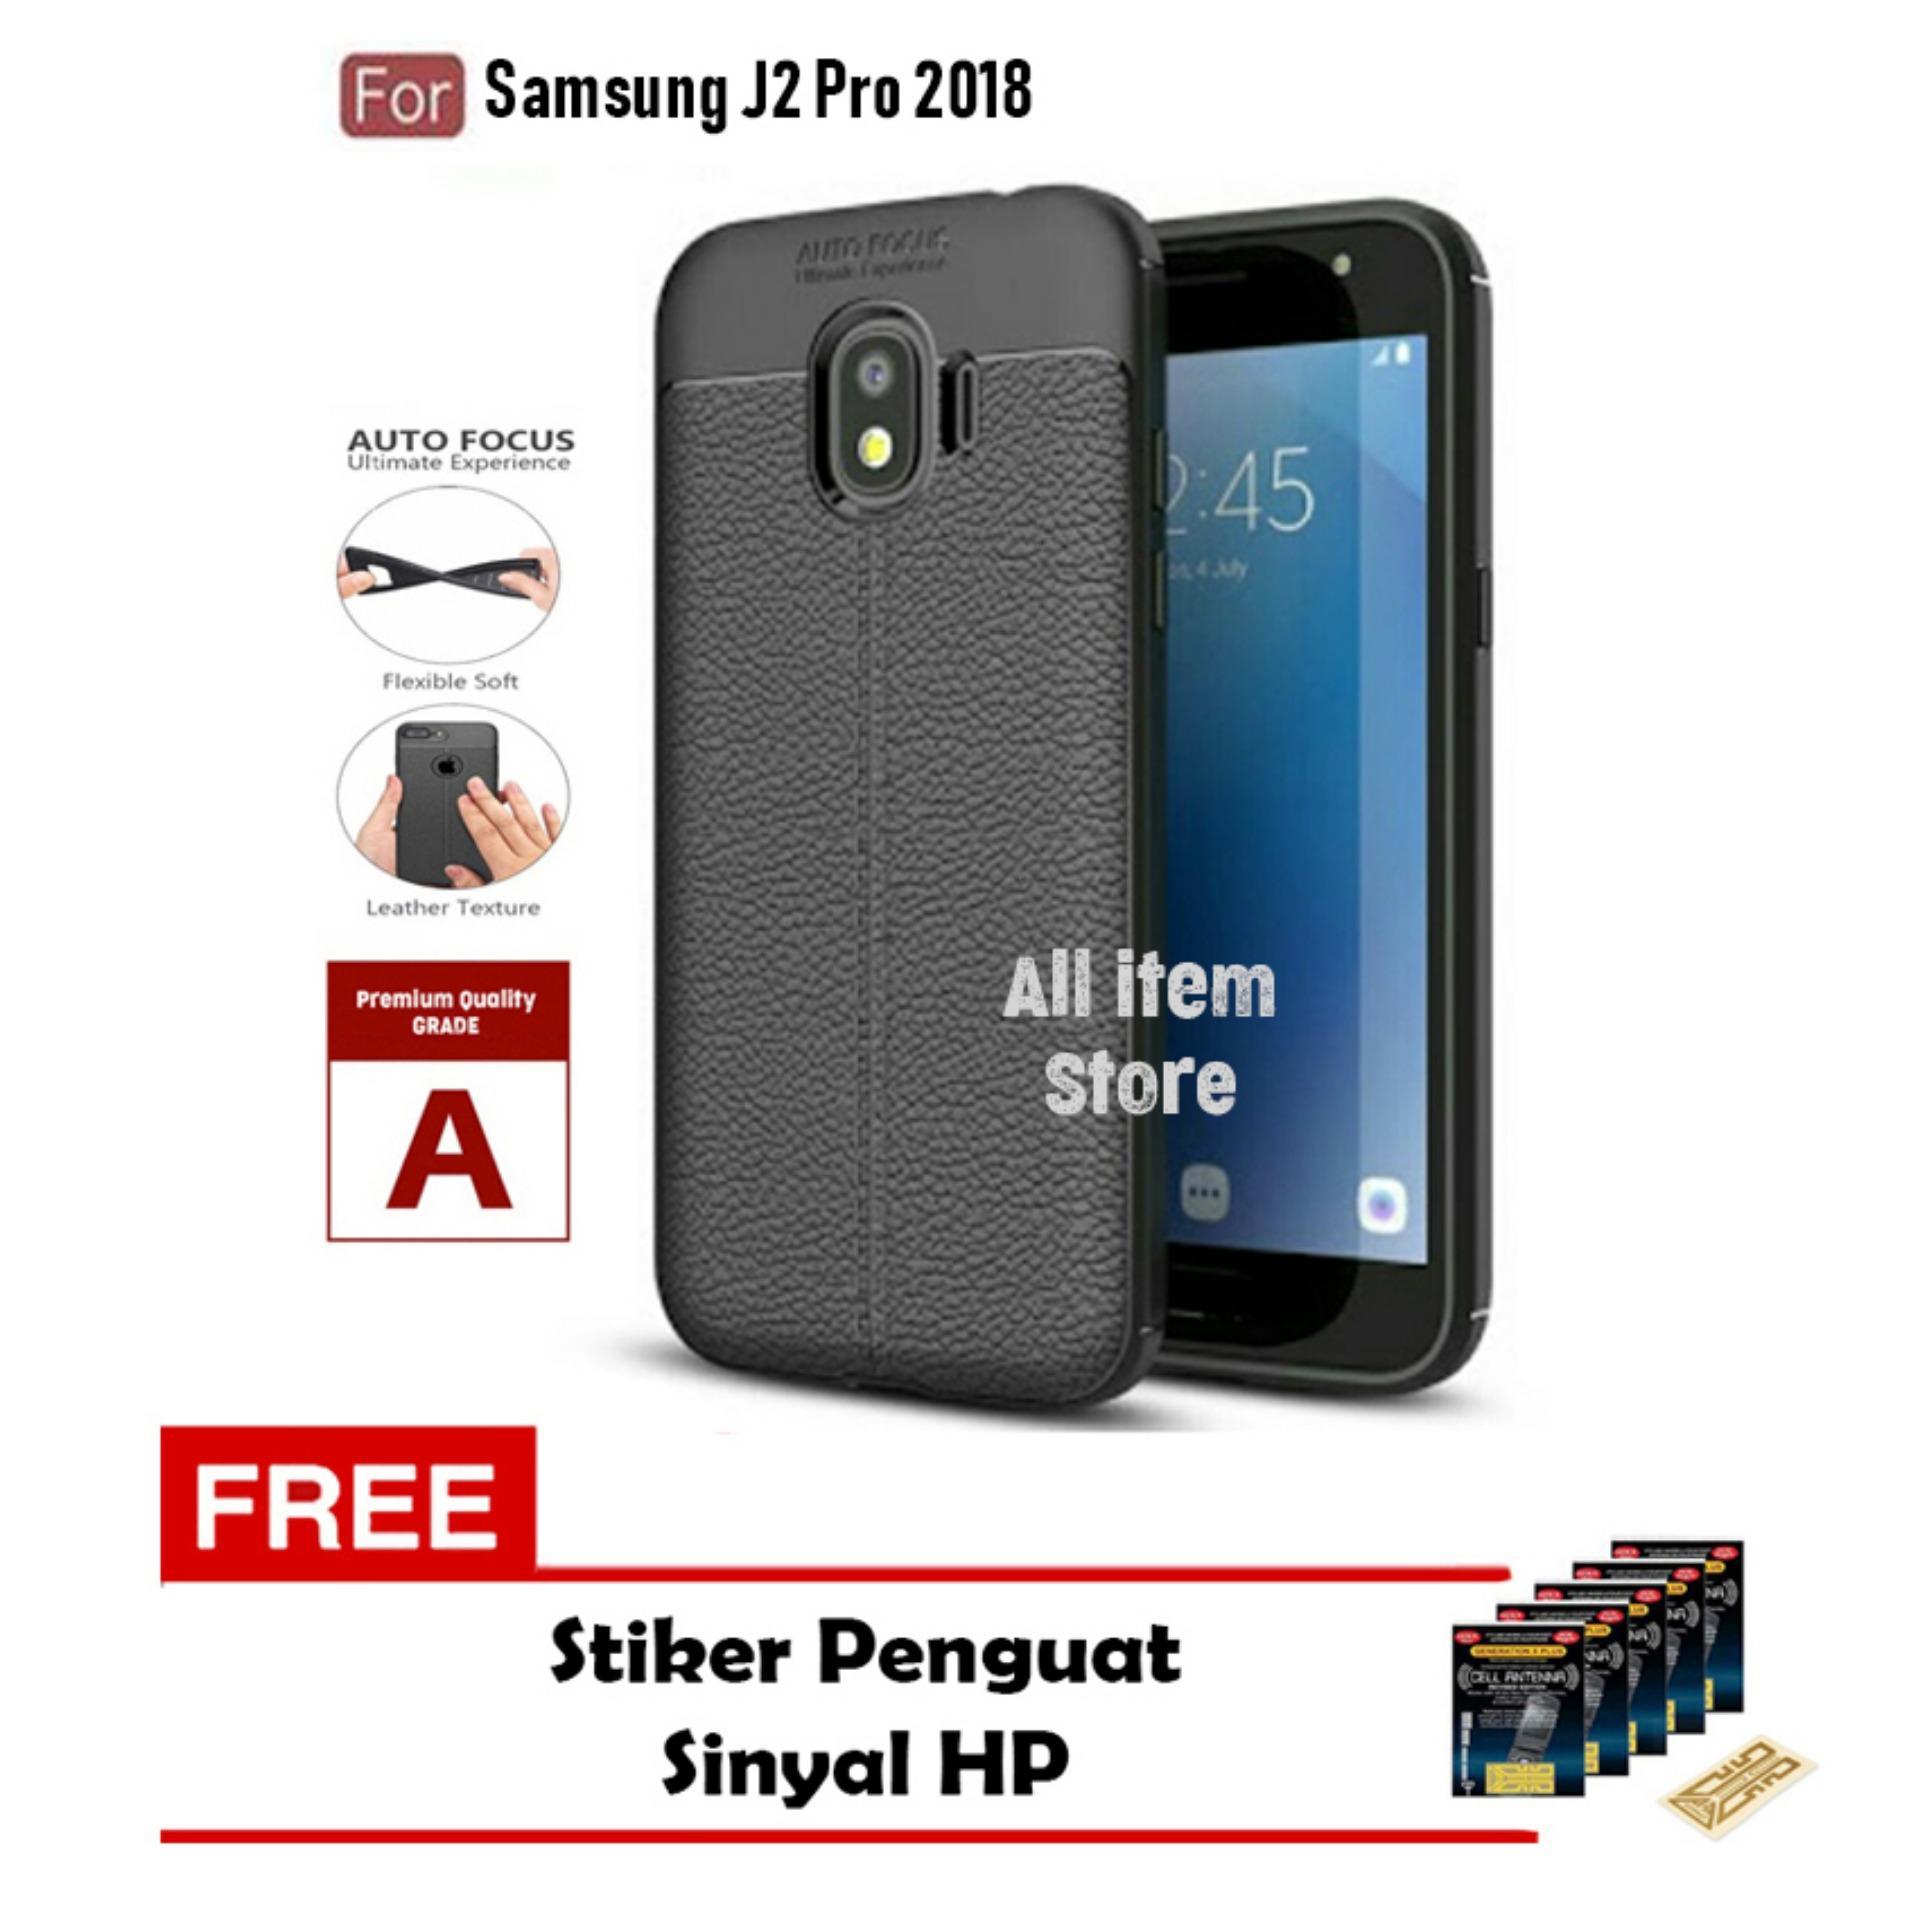 Case Auto Focus Samsung Galaxy J2 Pro Leather Black Matte Autofocus - Hitam + Free Stiker